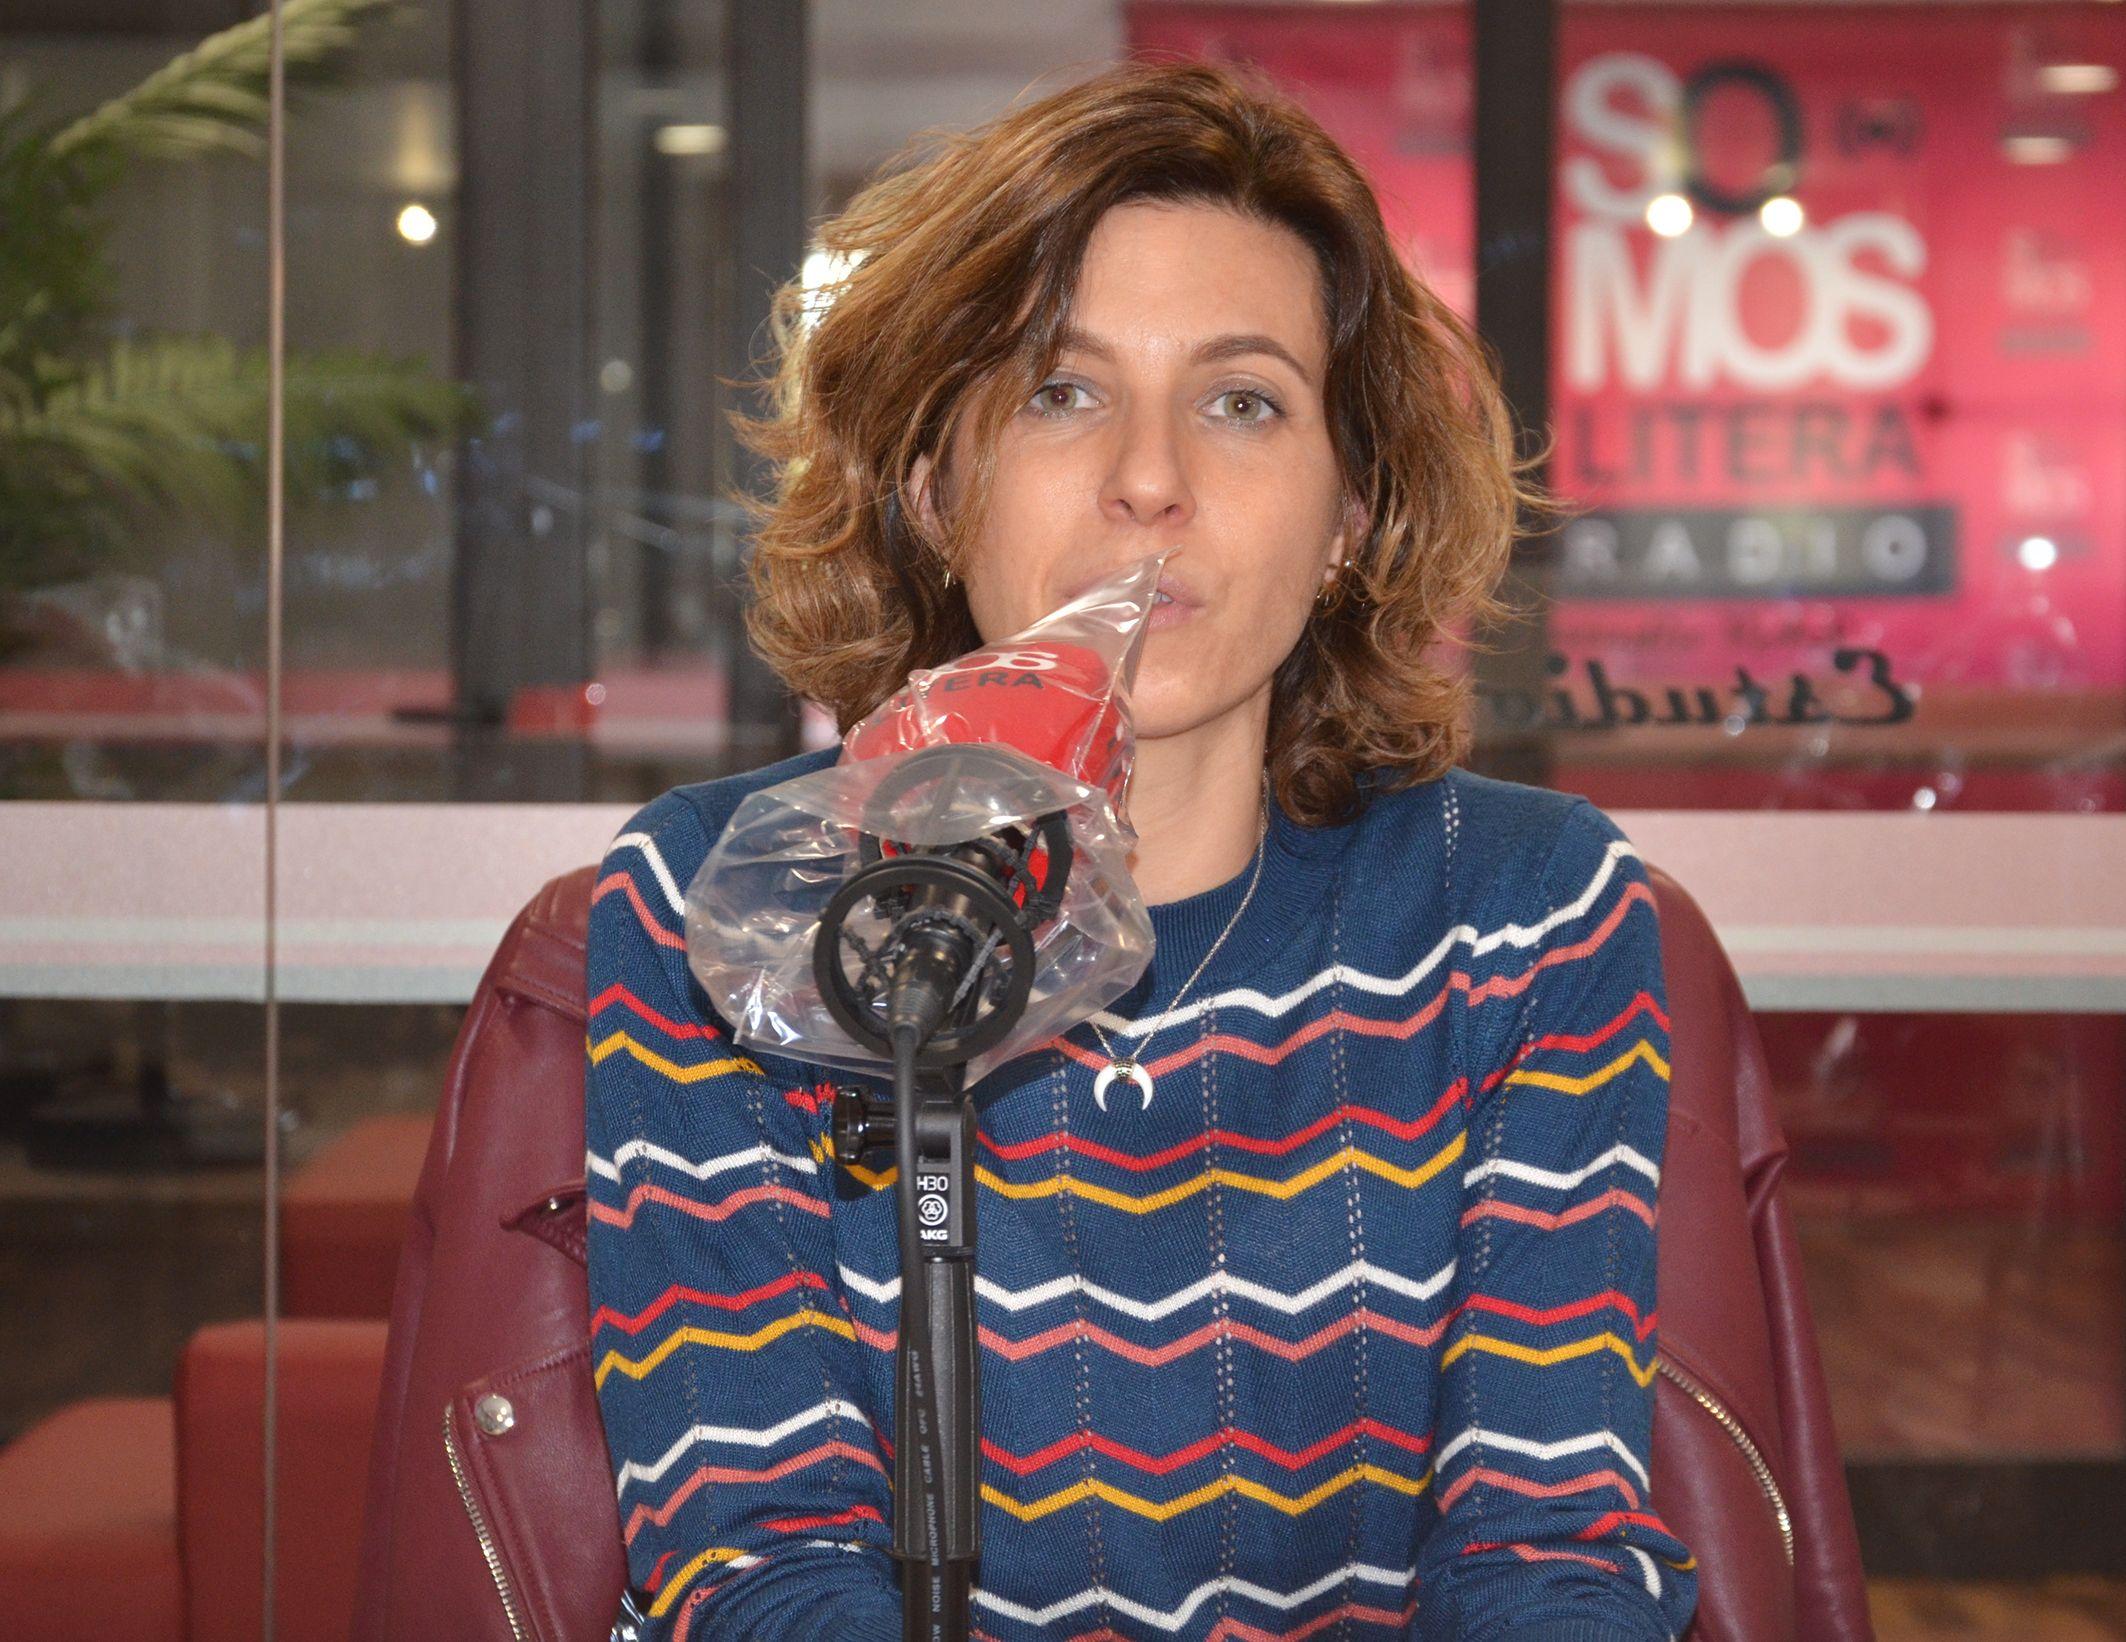 Marivi Torres